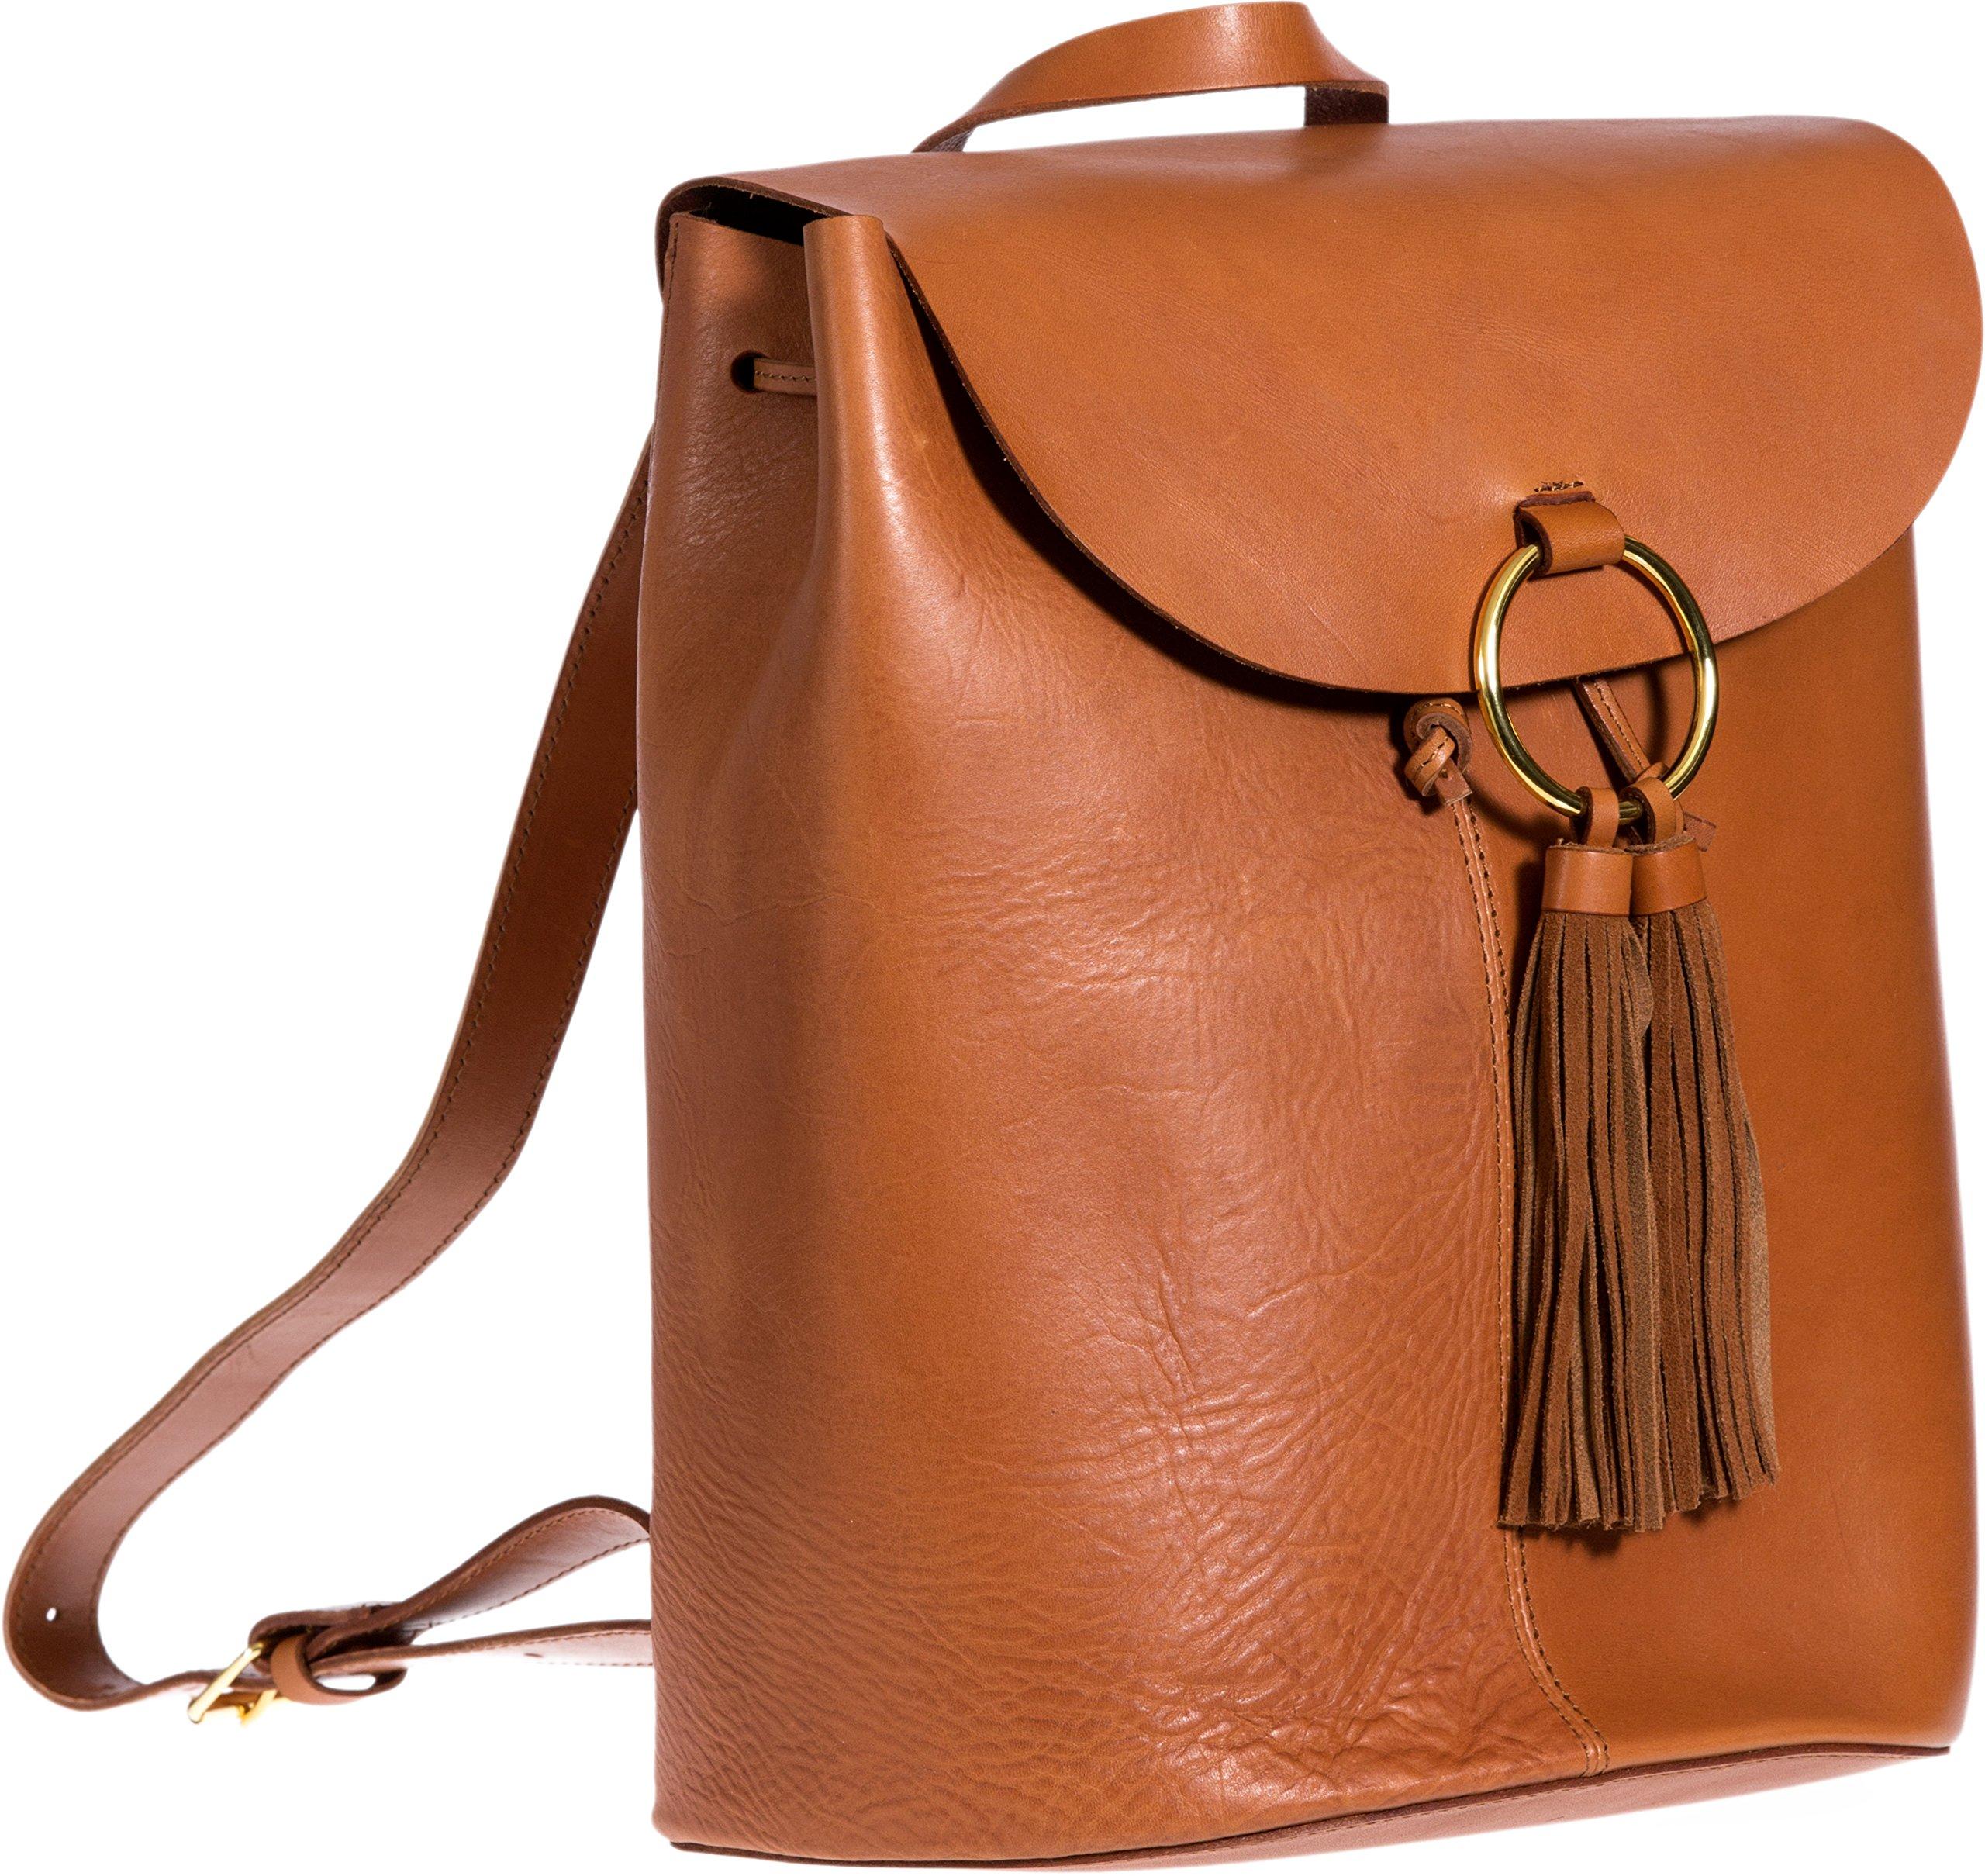 Horizon Argentine Leather Backpack Handbag by Overland Sheepskin Co